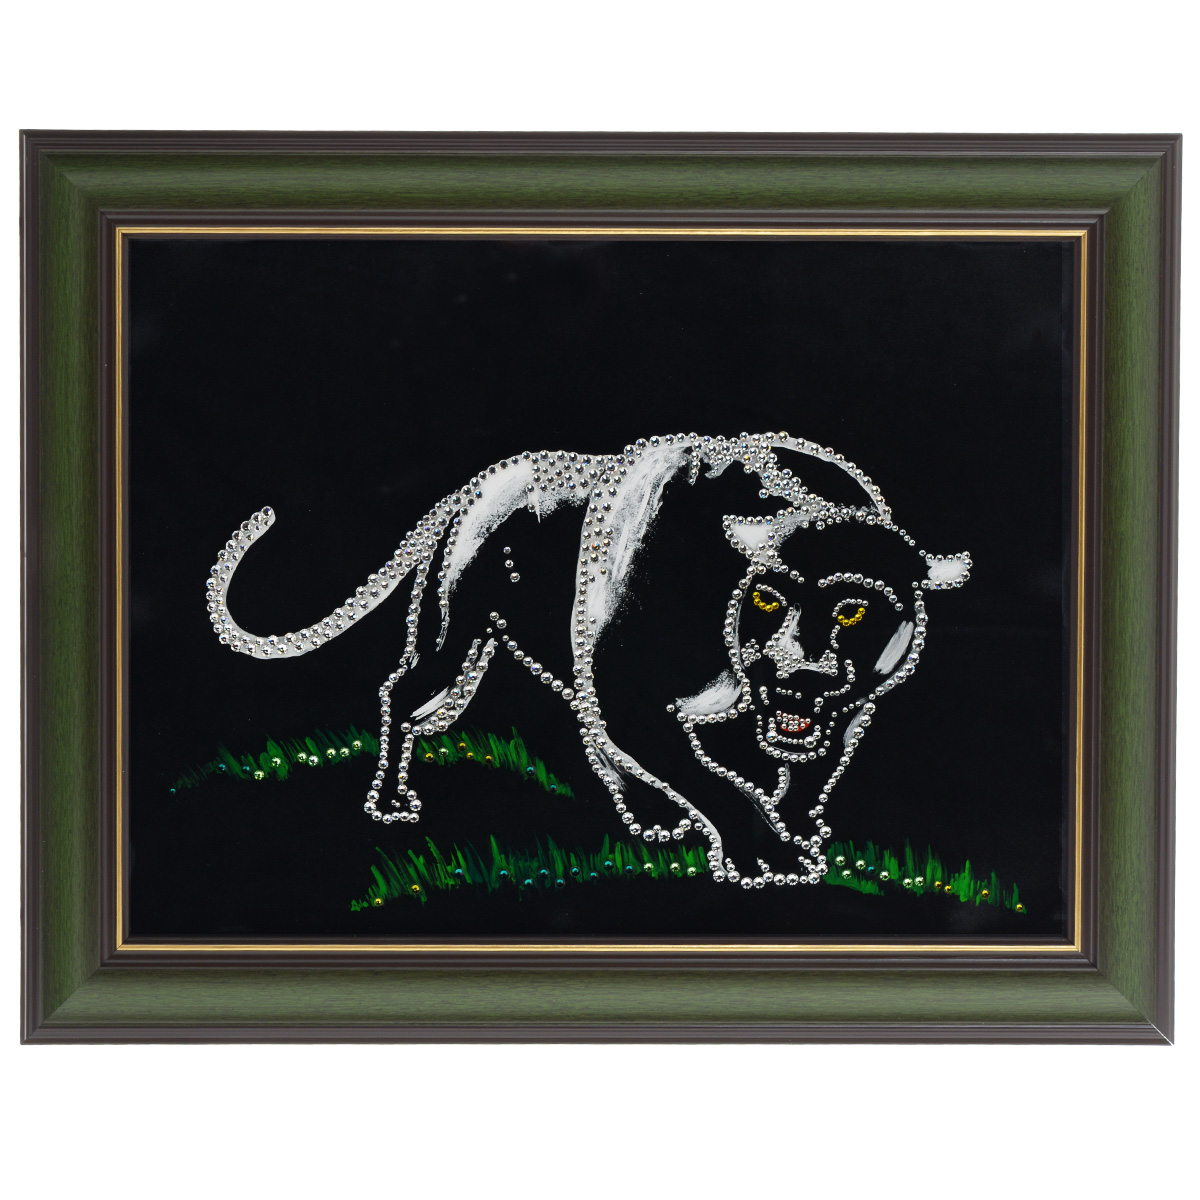 Картина с кристаллами Swarovski Пантера, 48 х 38 см картины в квартиру картина etude 2 102х130 см